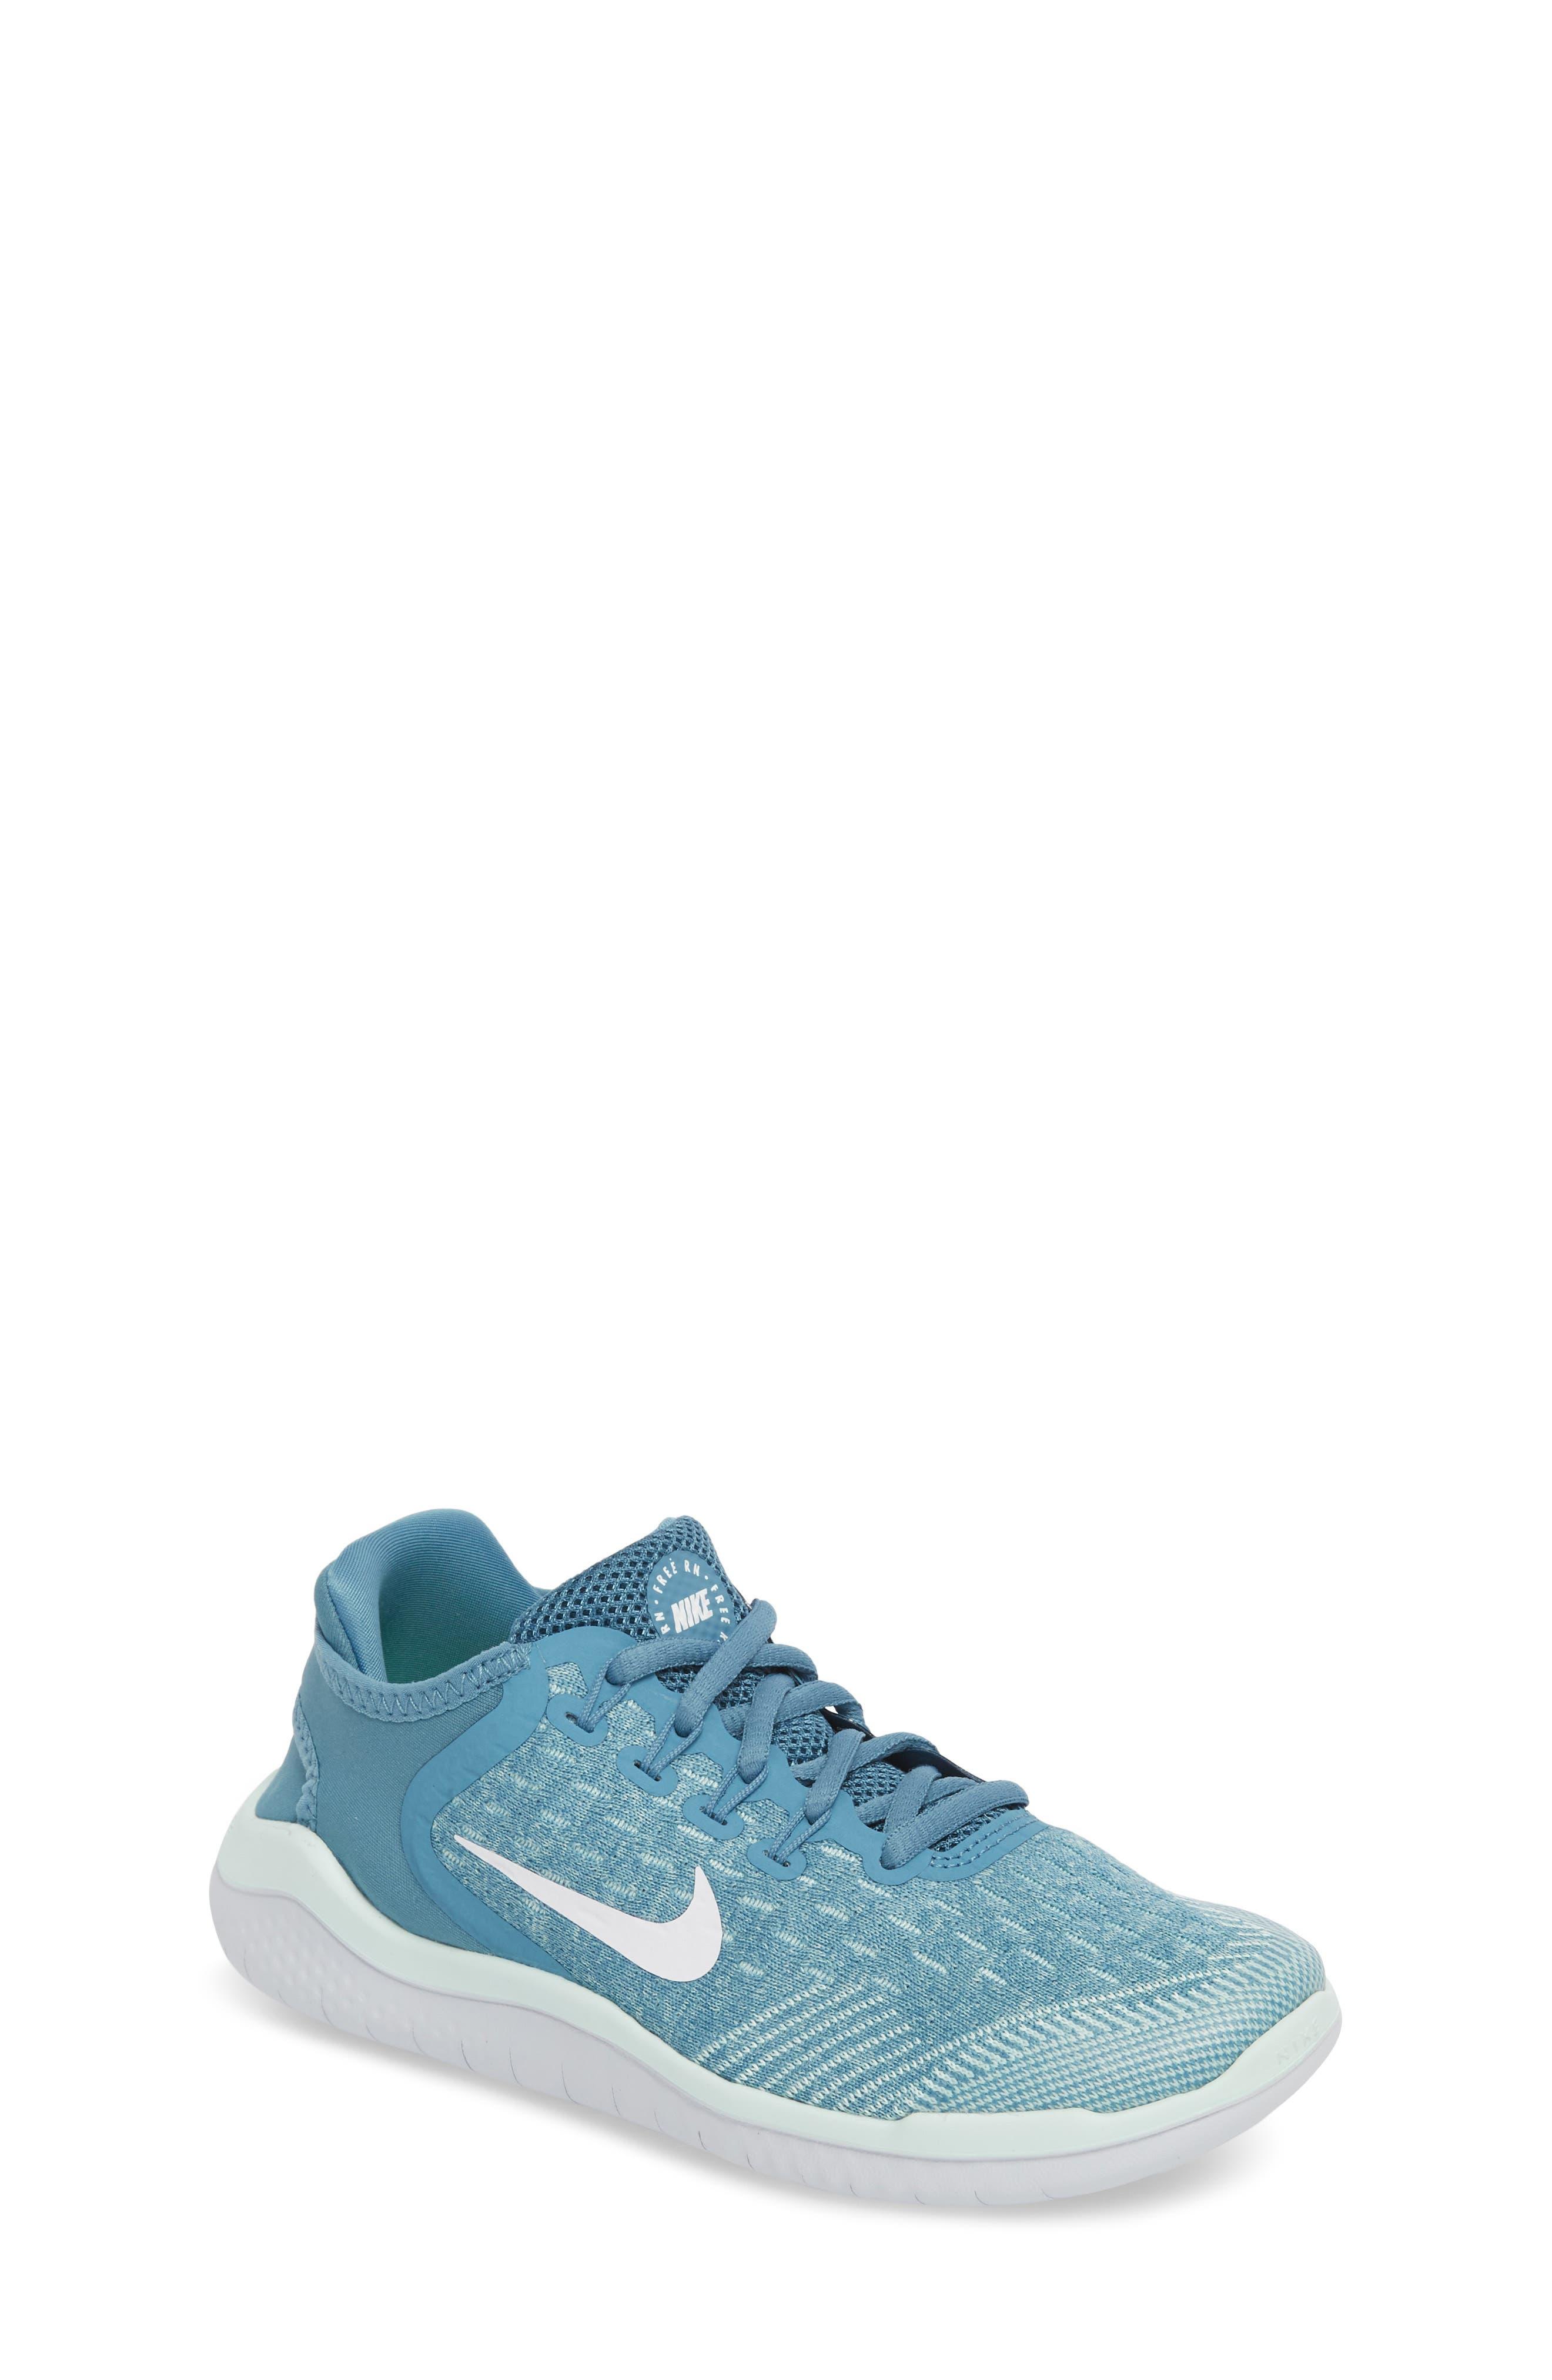 Free RN 2018 Running Shoe,                             Main thumbnail 1, color,                             AQUA/ WHITE/ PURE PLATINUM